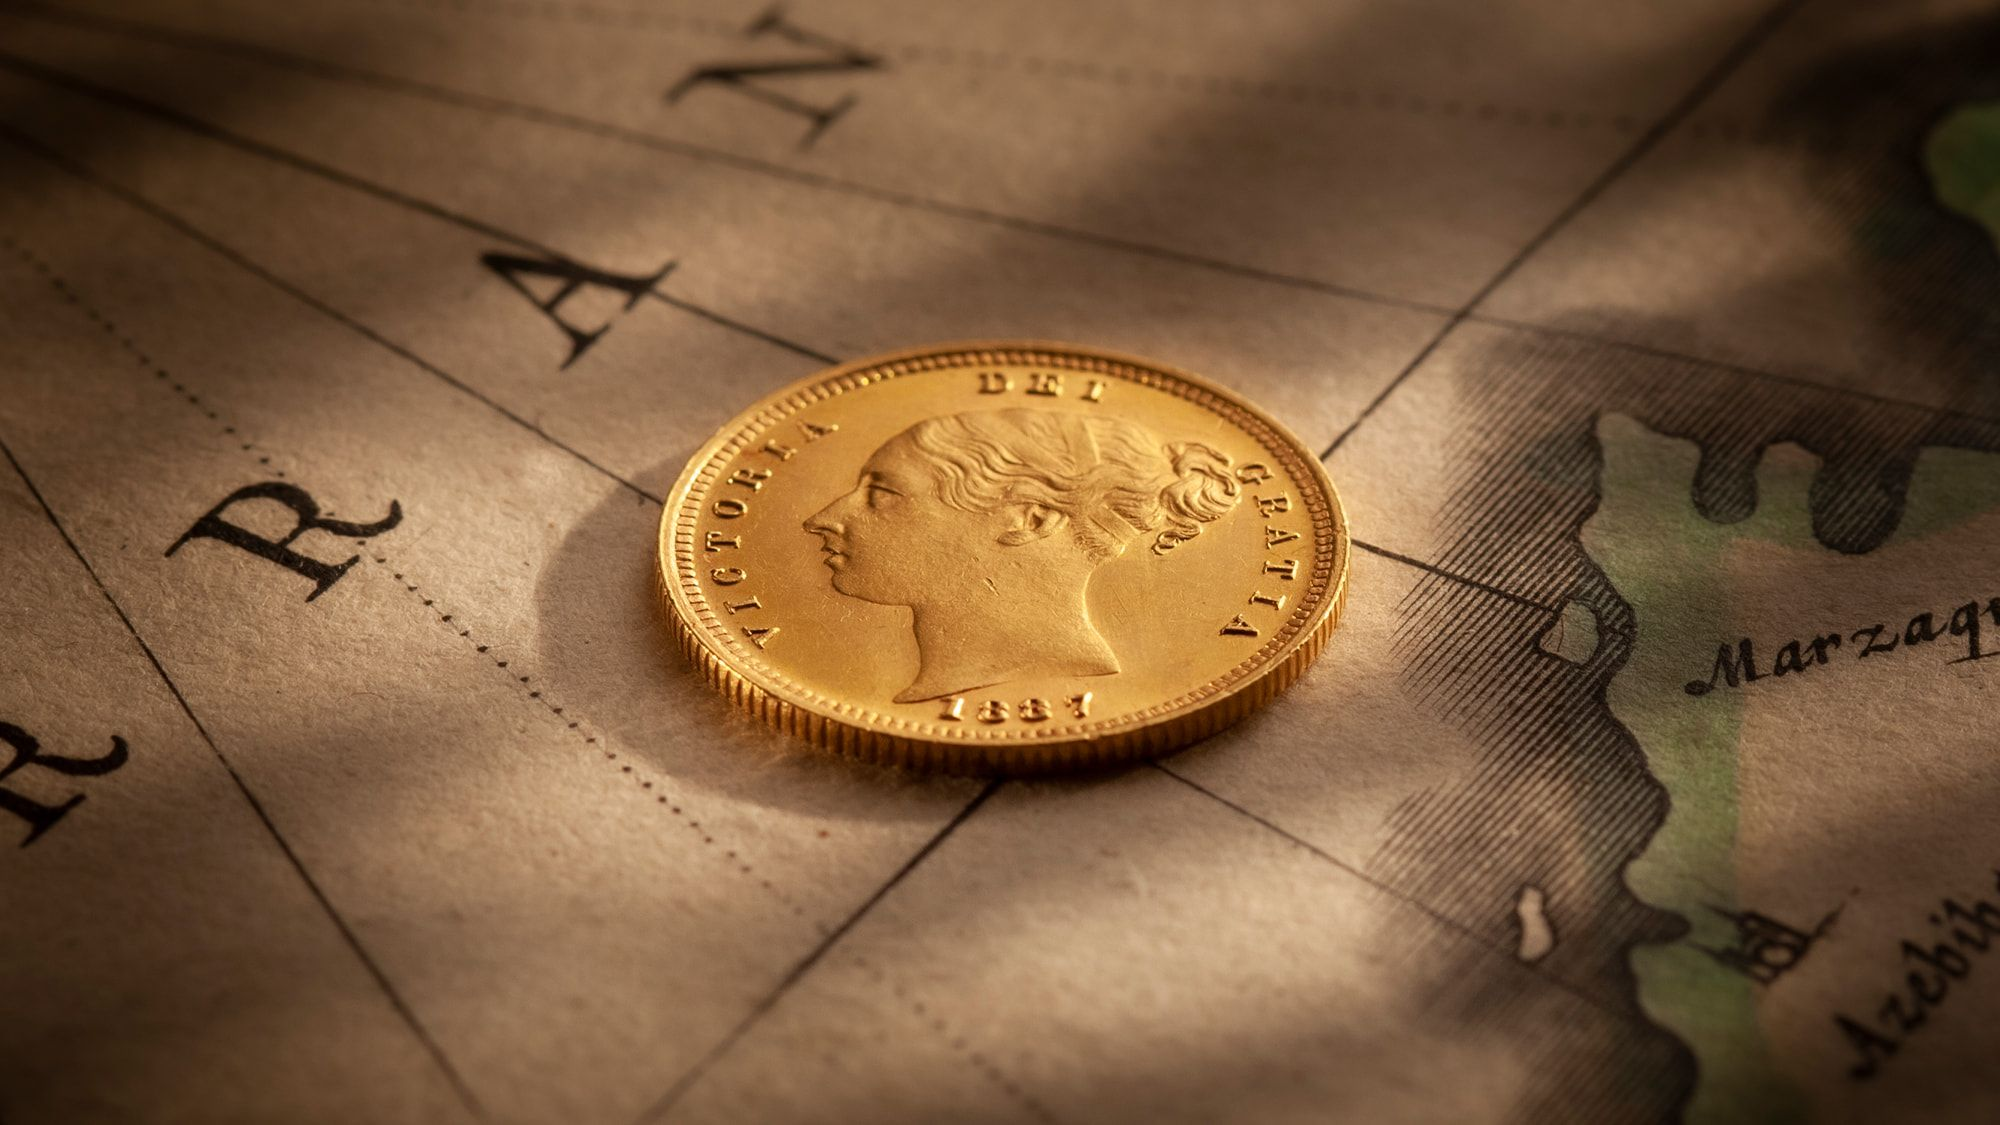 1887-Half-Sovereign-chUNC-obv-22519-February-2021